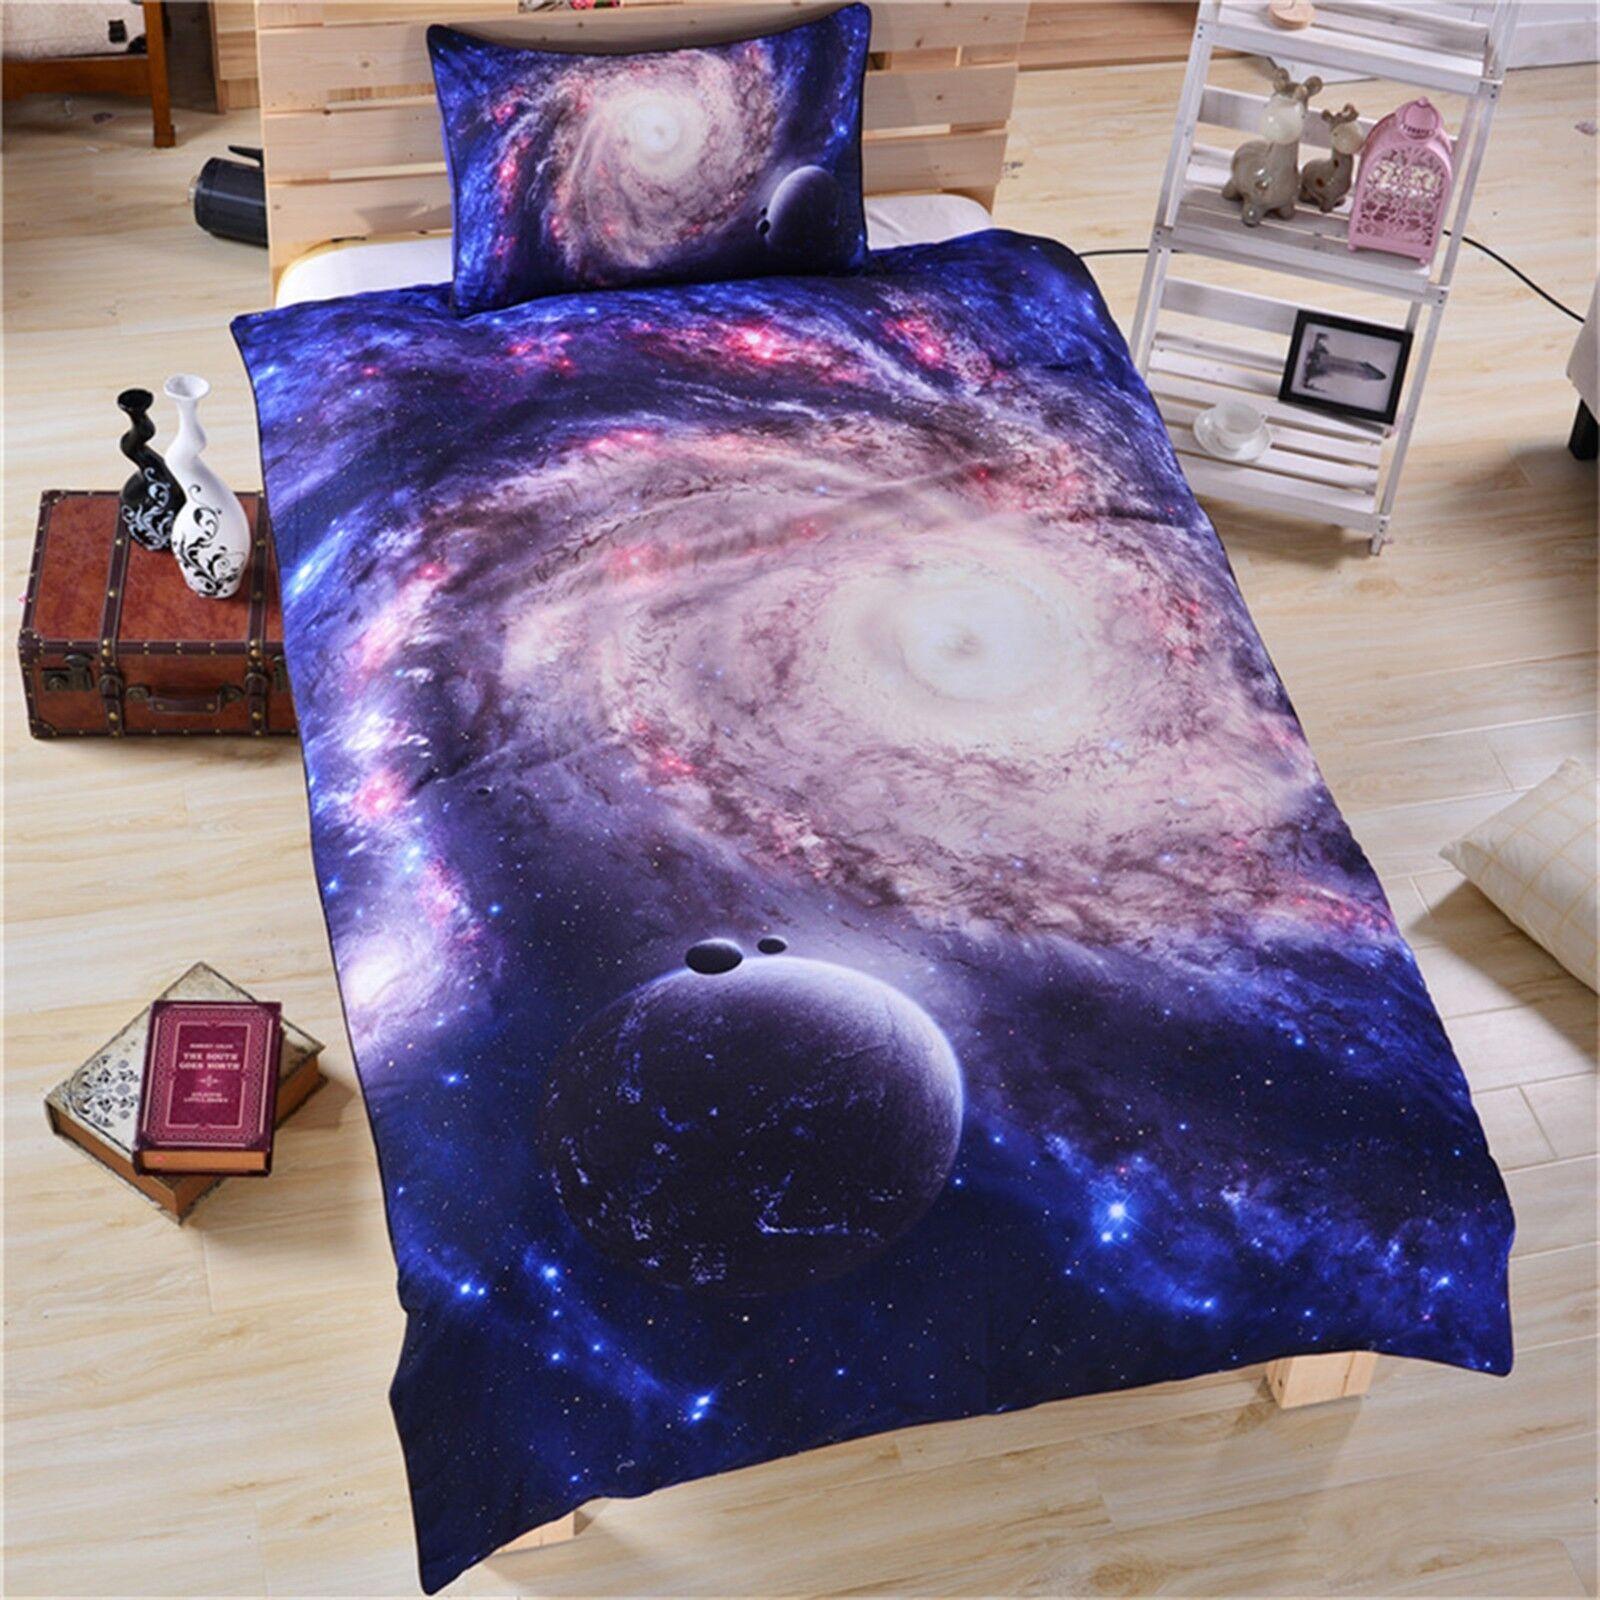 3D Interstellar Planets 4 Bed Pillowcases Quilt Duvet Cover Set Single Queen CA